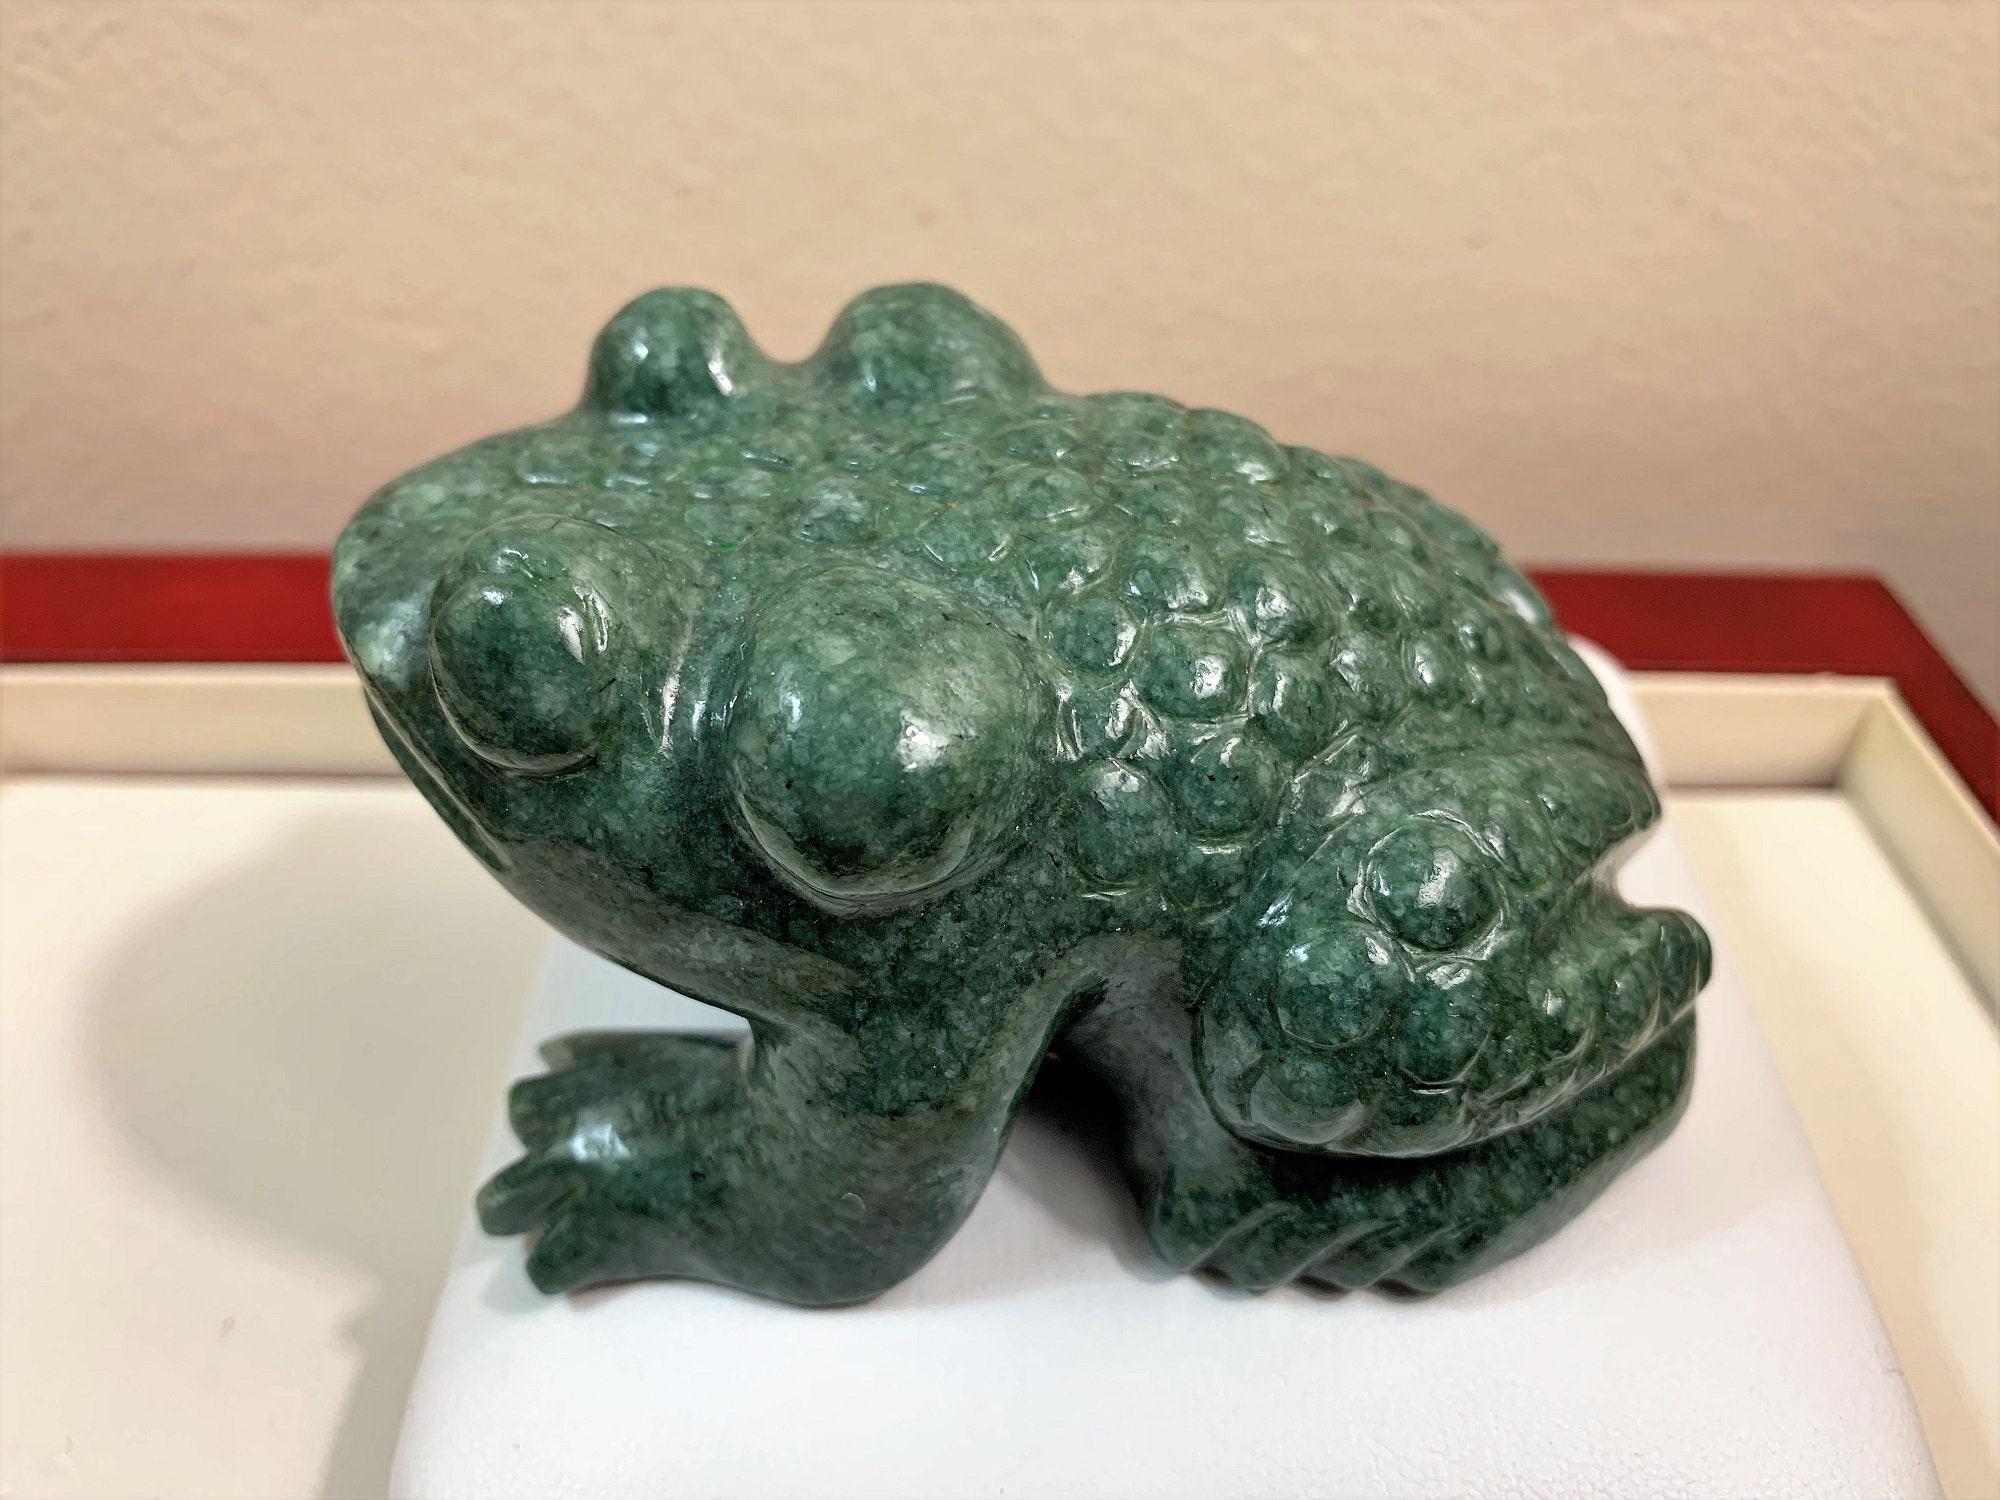 Guatemalan Green Jadeit - Jade Carved Frog, Mayan Symbol of